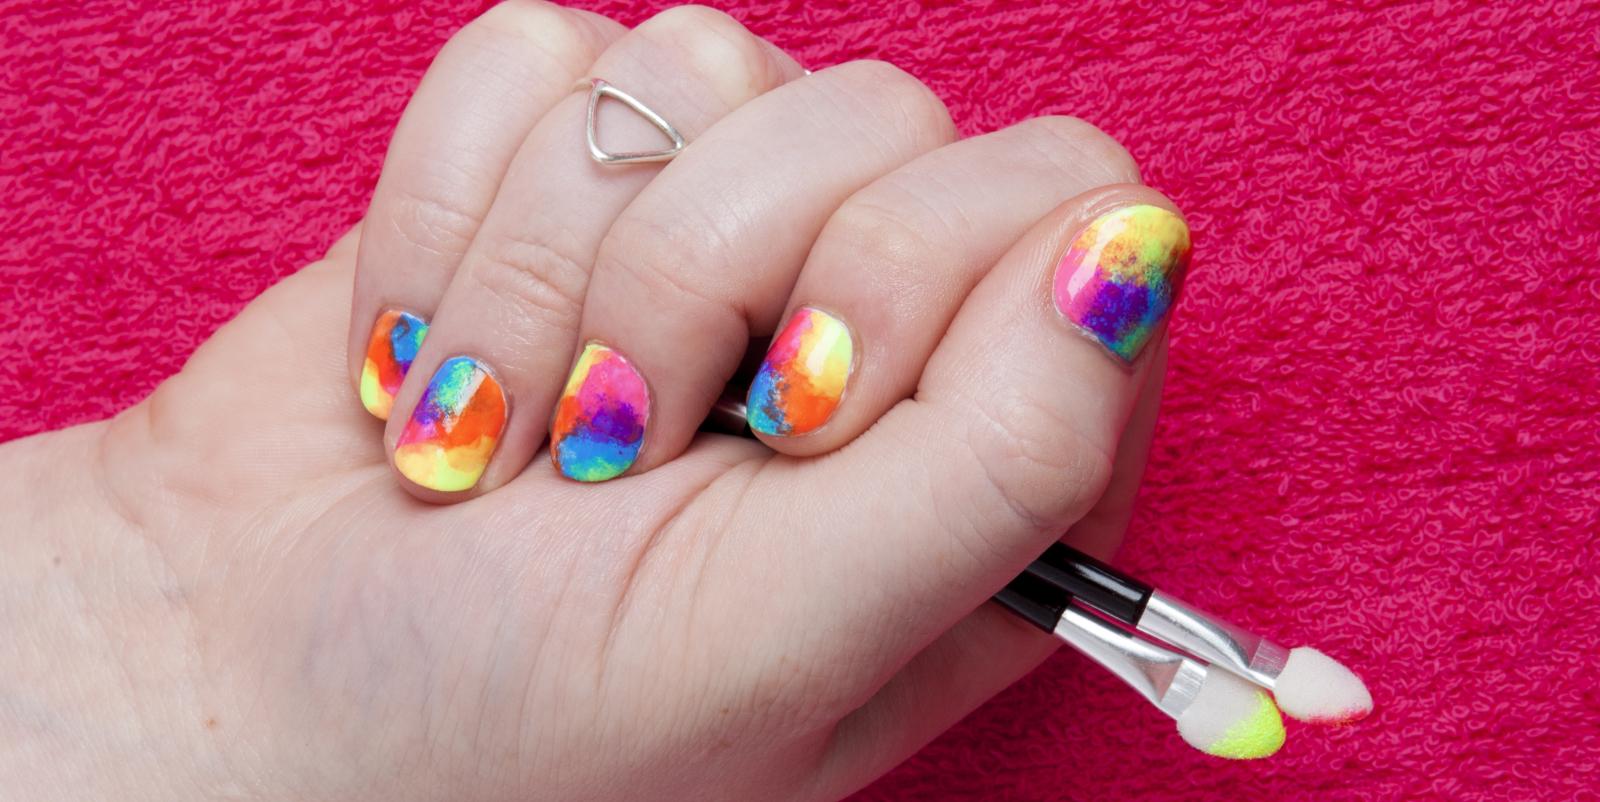 Easy Nail Designs Tie Dye: The nail artista extraordinaire easy ...